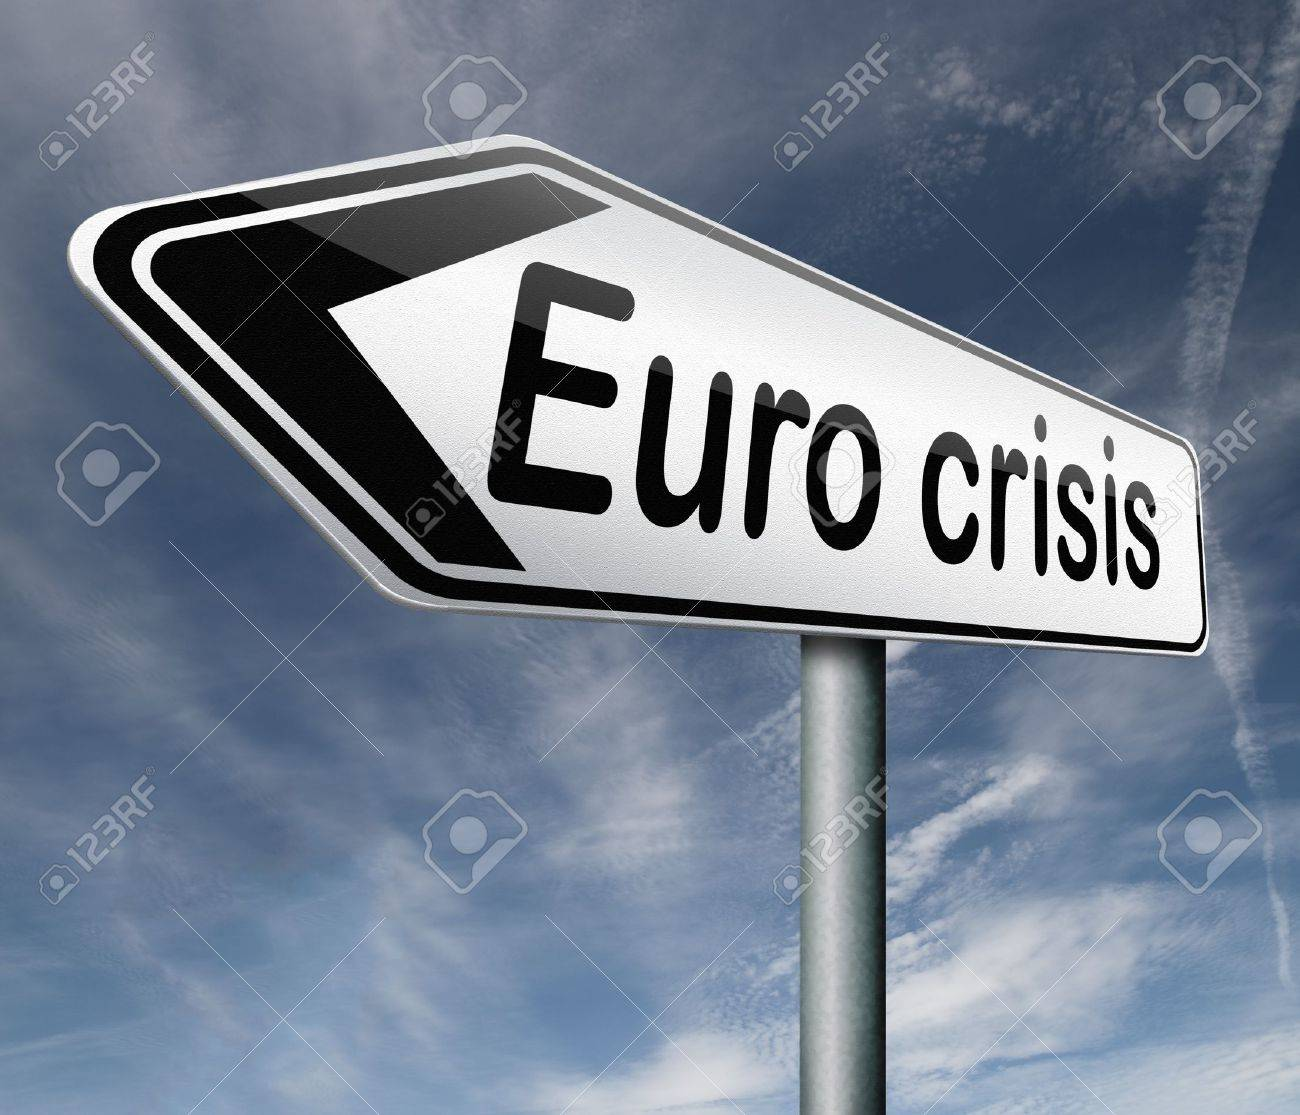 Euro crisis bank crash credit or housing bubble leading to economic recession or depression Stock Photo - 16575531